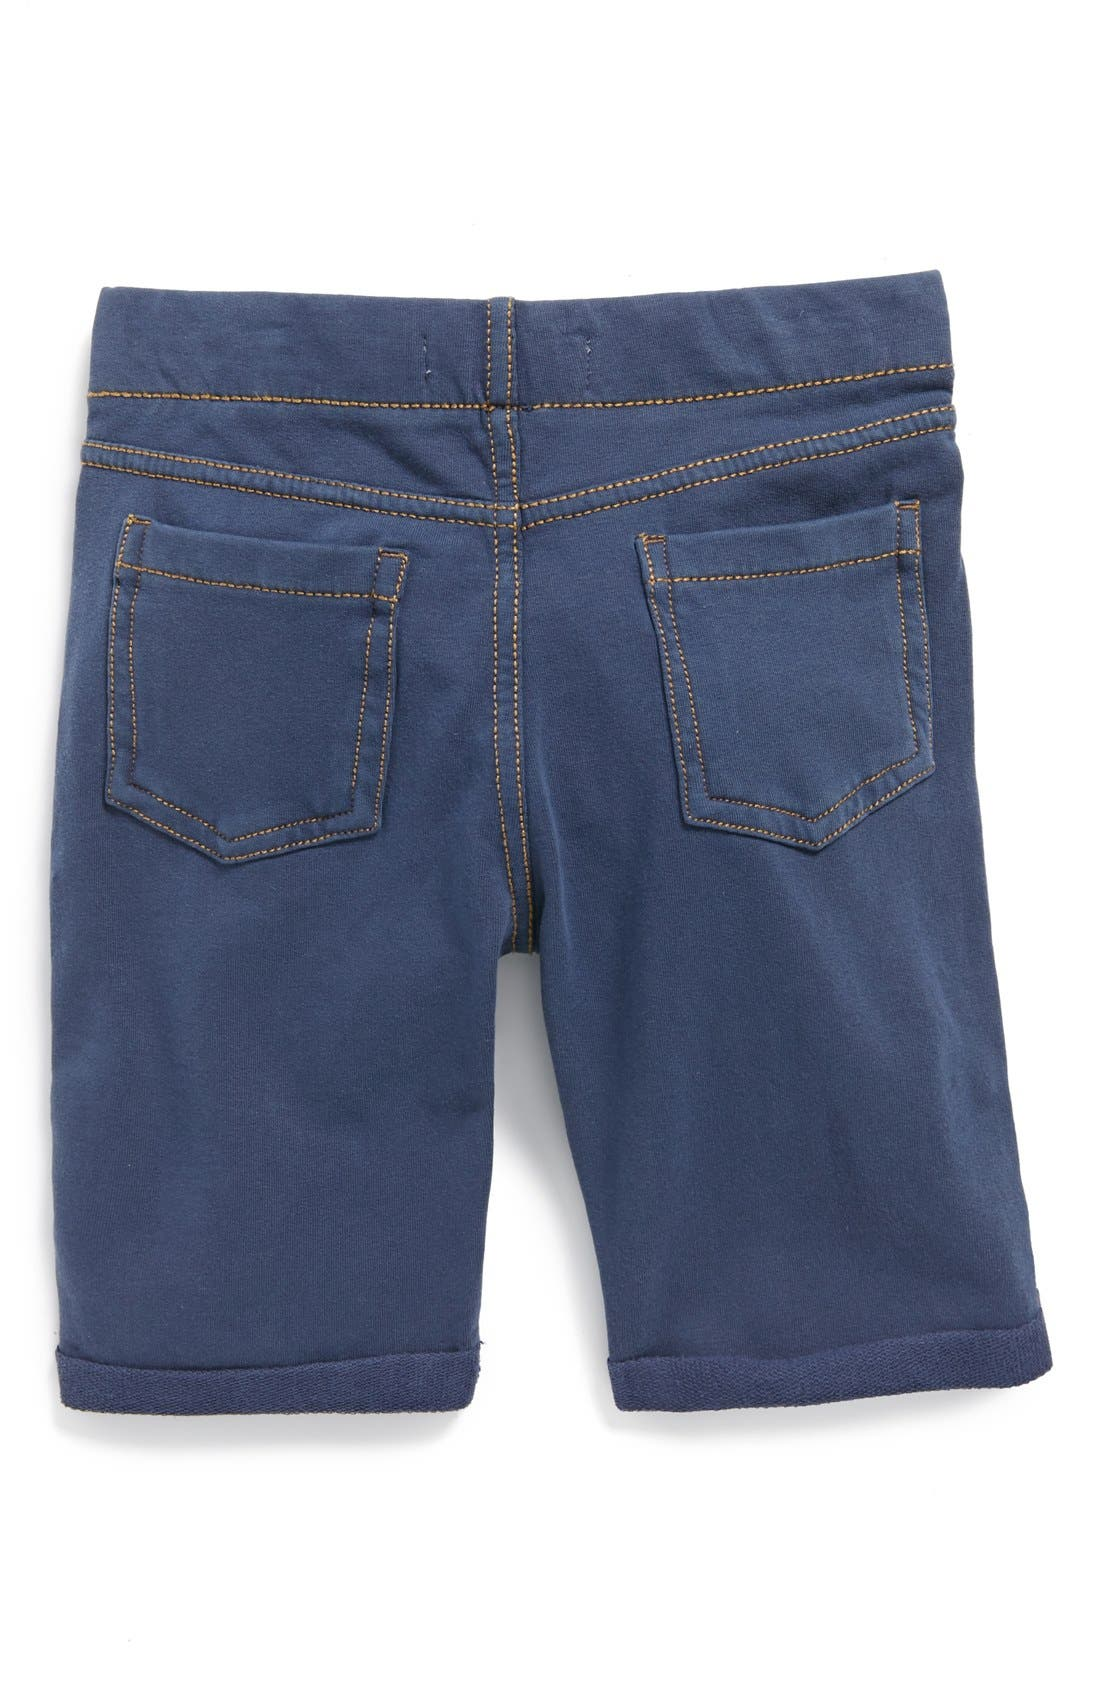 Alternate Image 1 Selected - Tucker + Tate 'Jenna' Jegging Shorts (Toddler Girls)